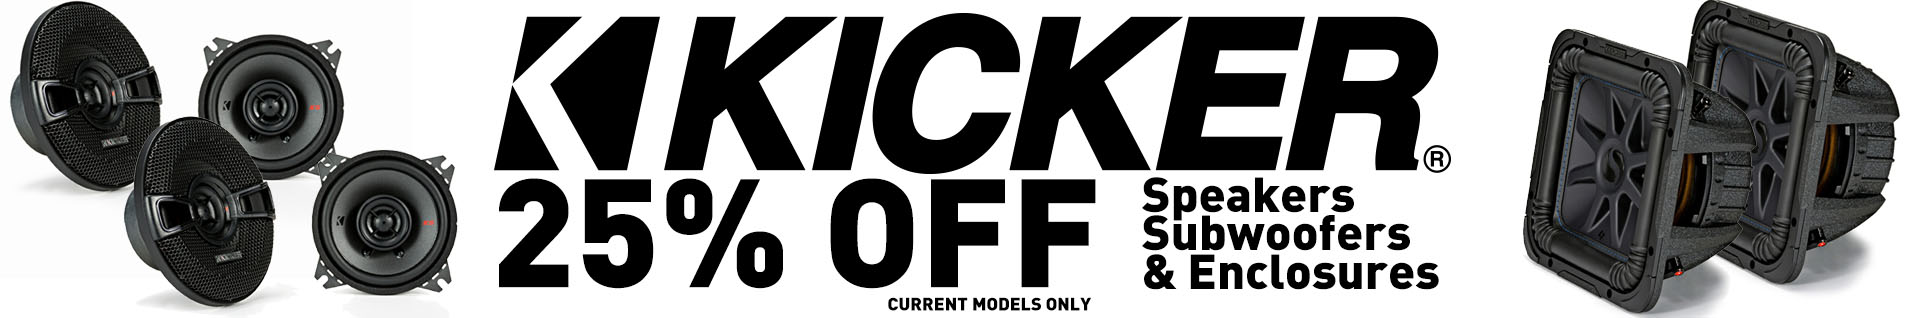 kicker25offcarousel.jpg